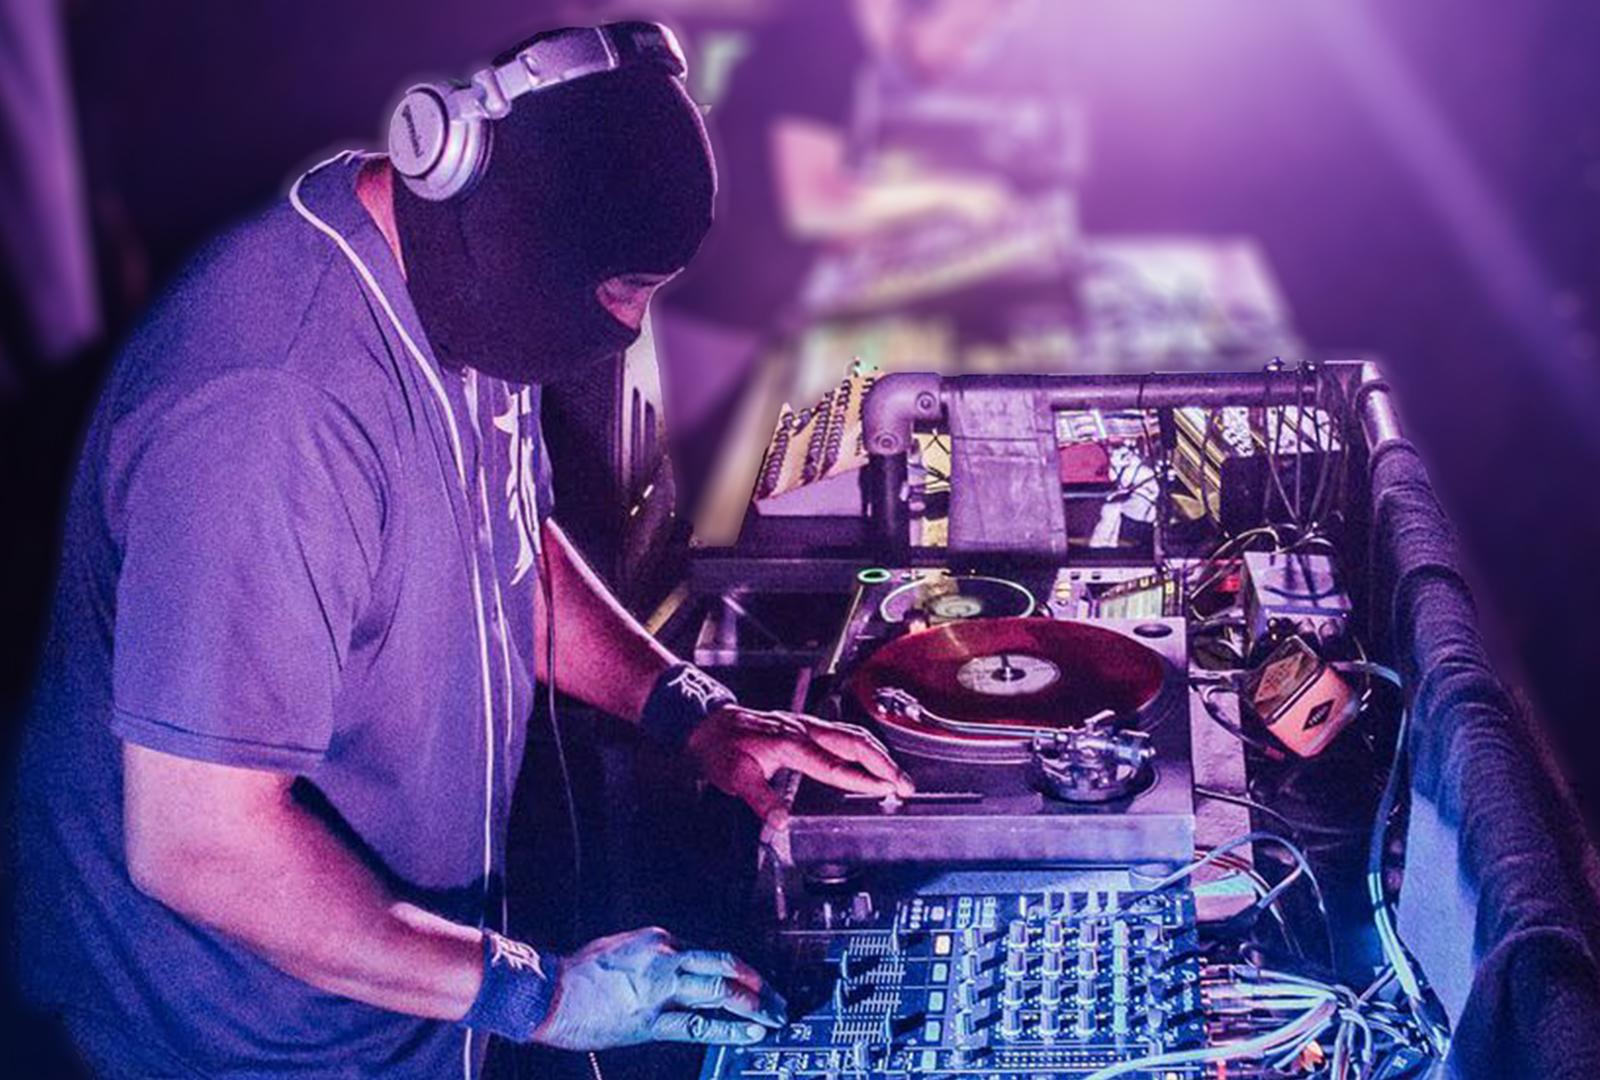 DJ Stingray 313 re-launches his Micron Audio label